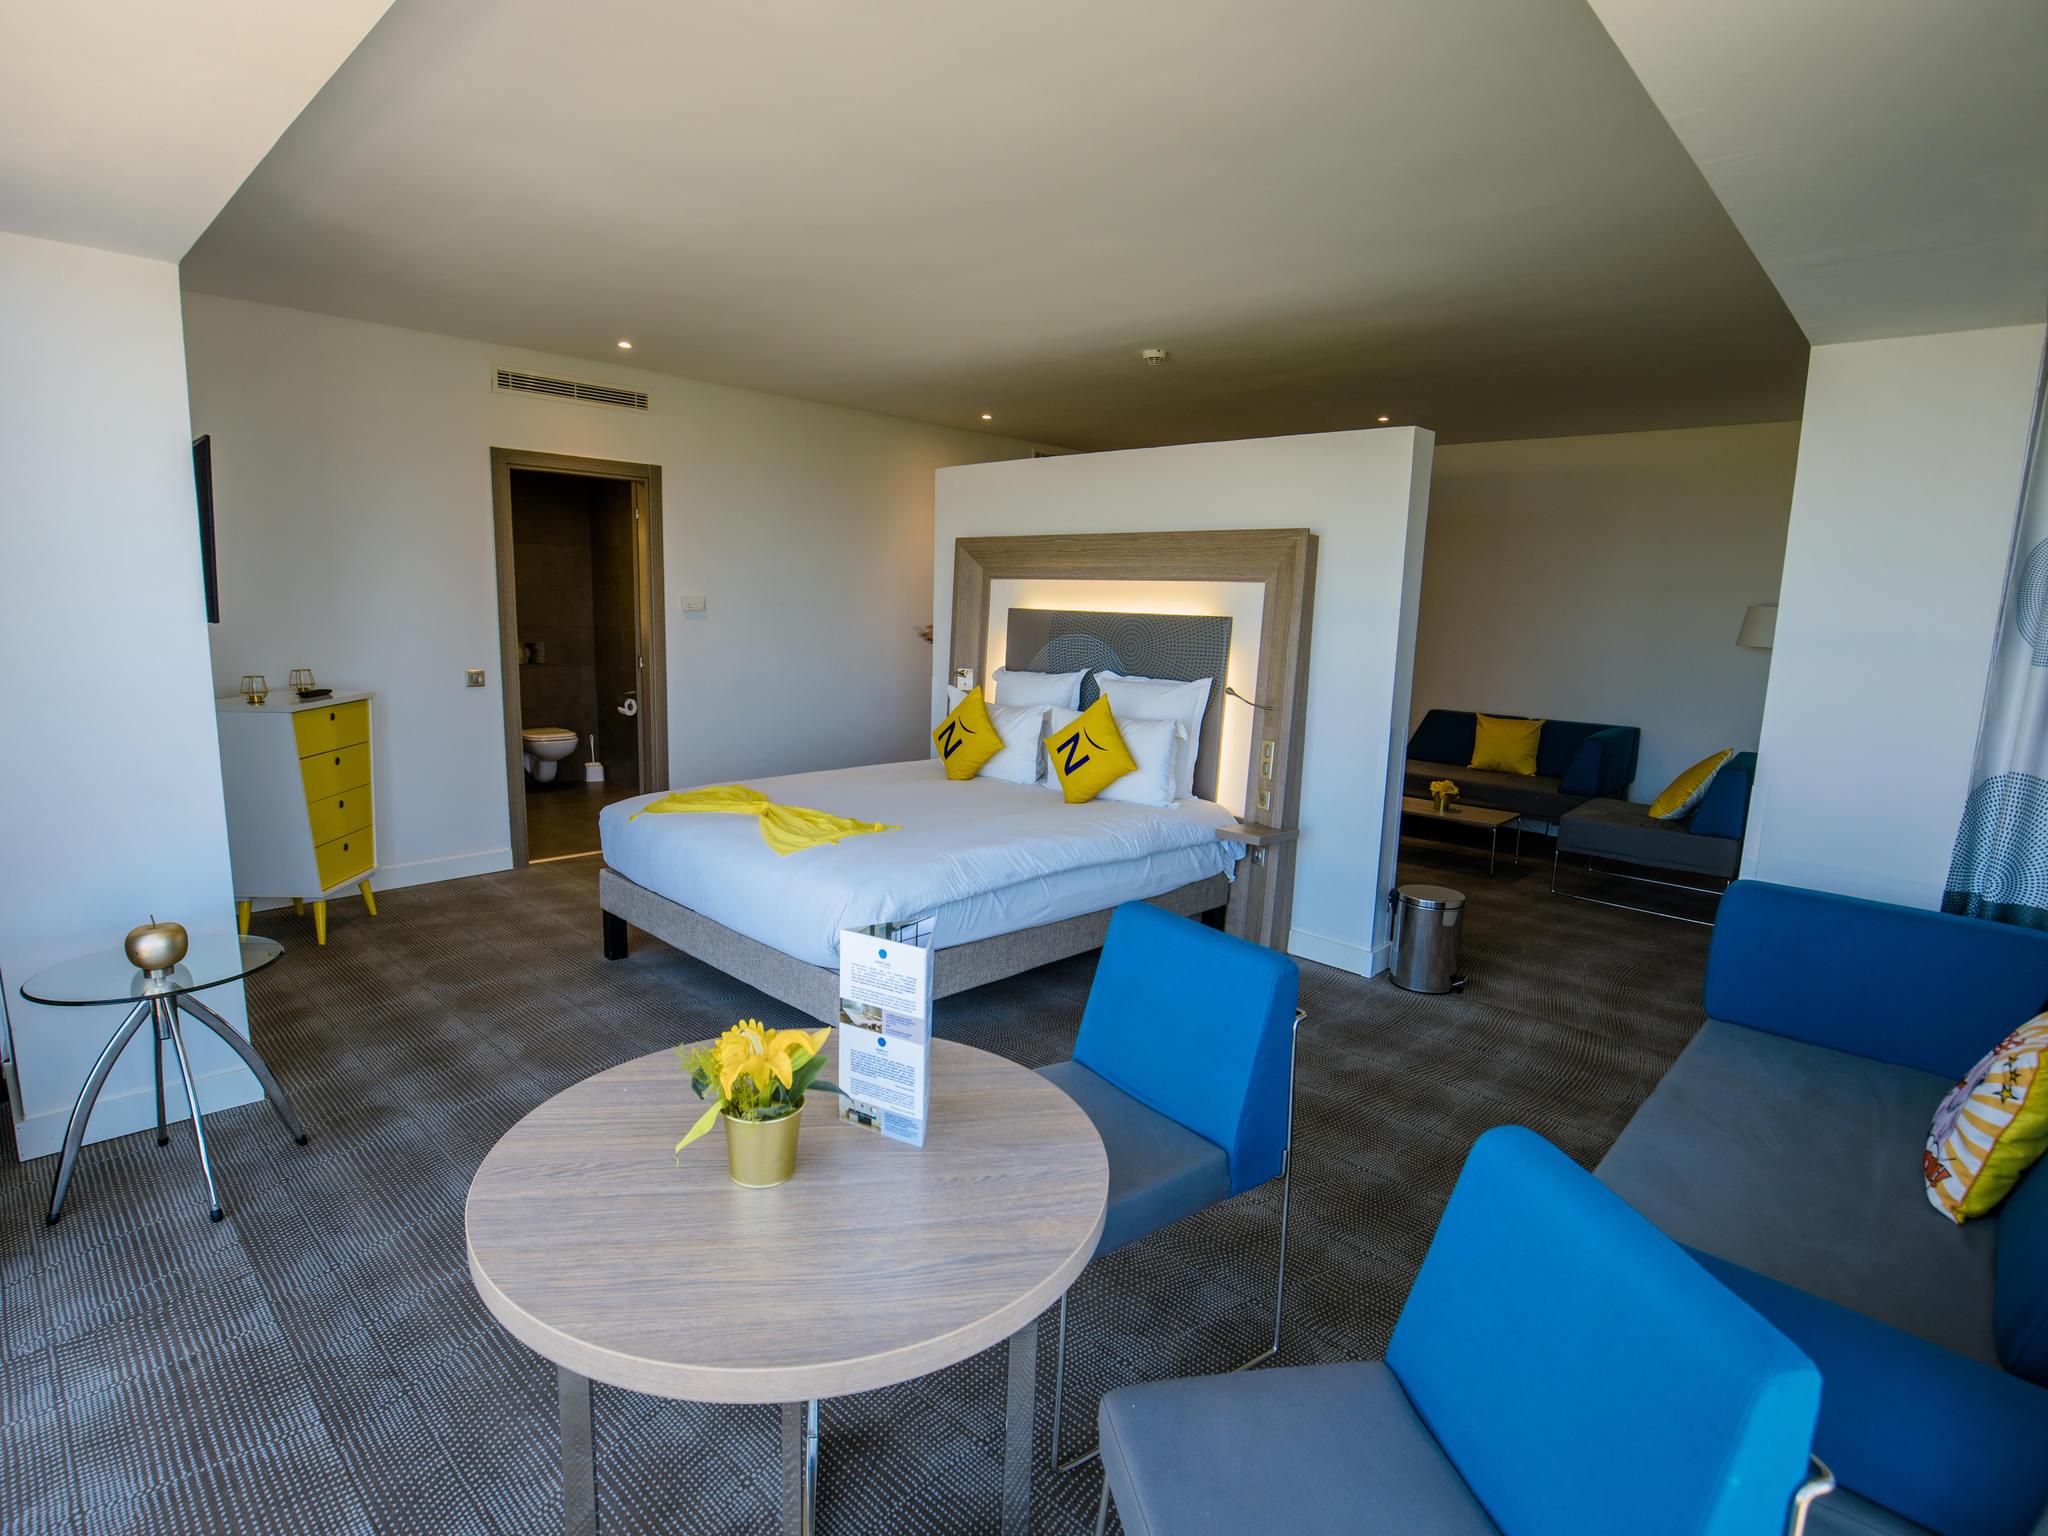 Hotel – Novotel Mohammedia (Ouverture Juin 2018)